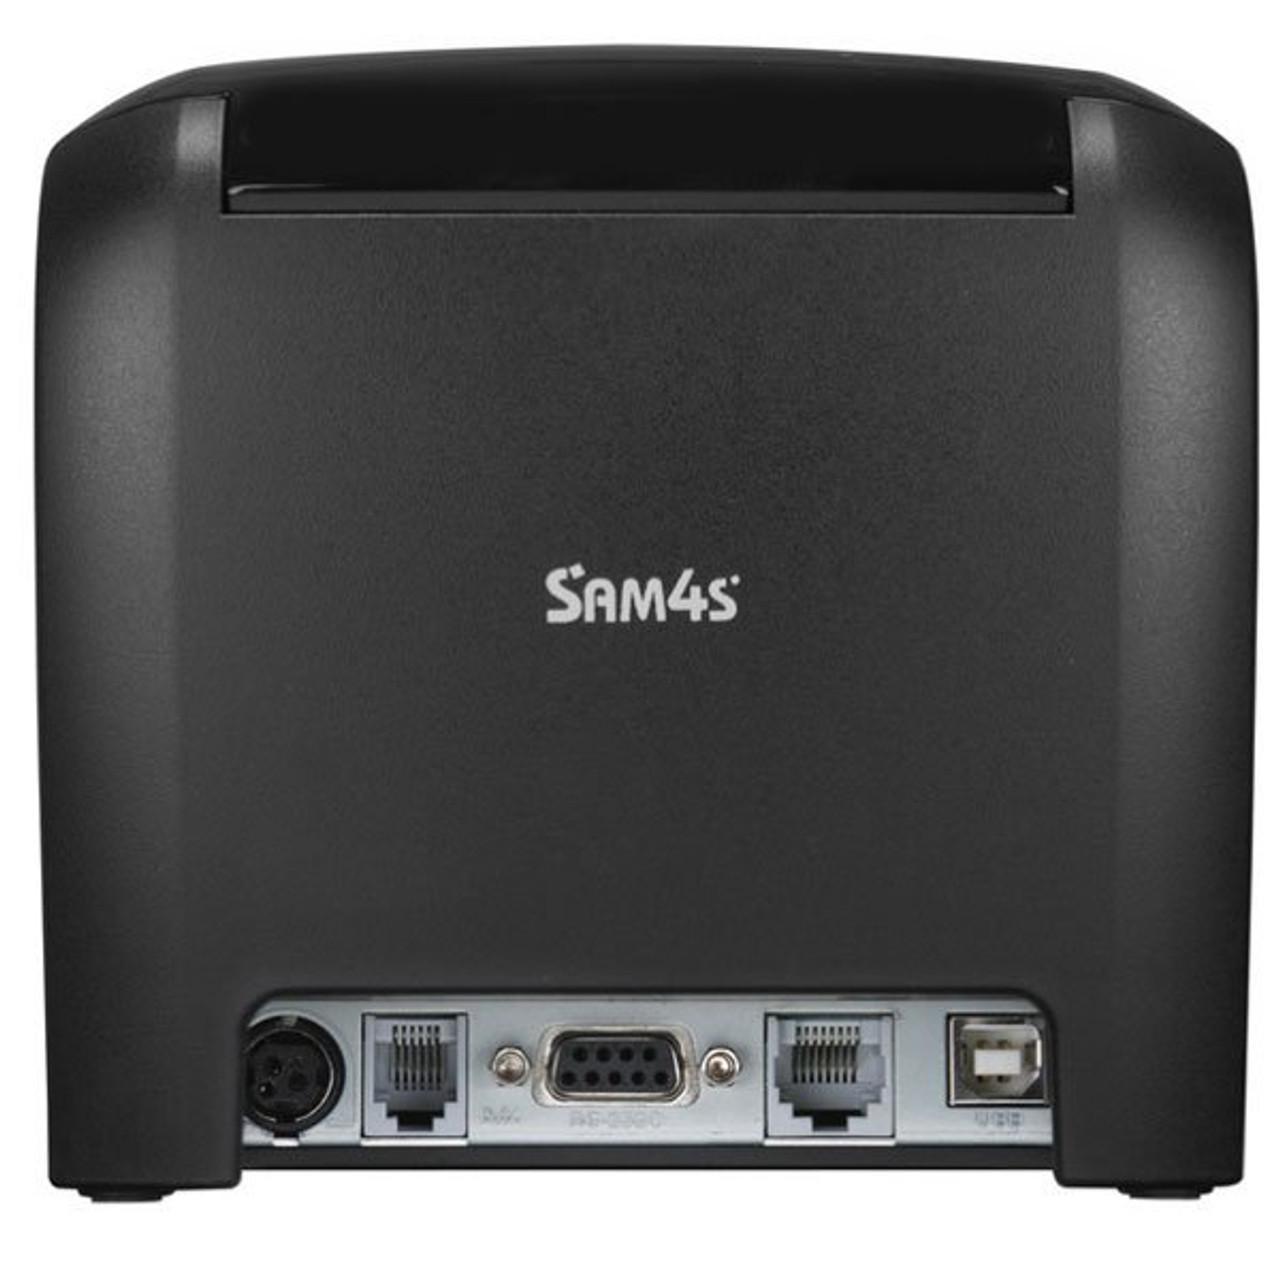 SAM4s GIANT 100 Receipt Printer